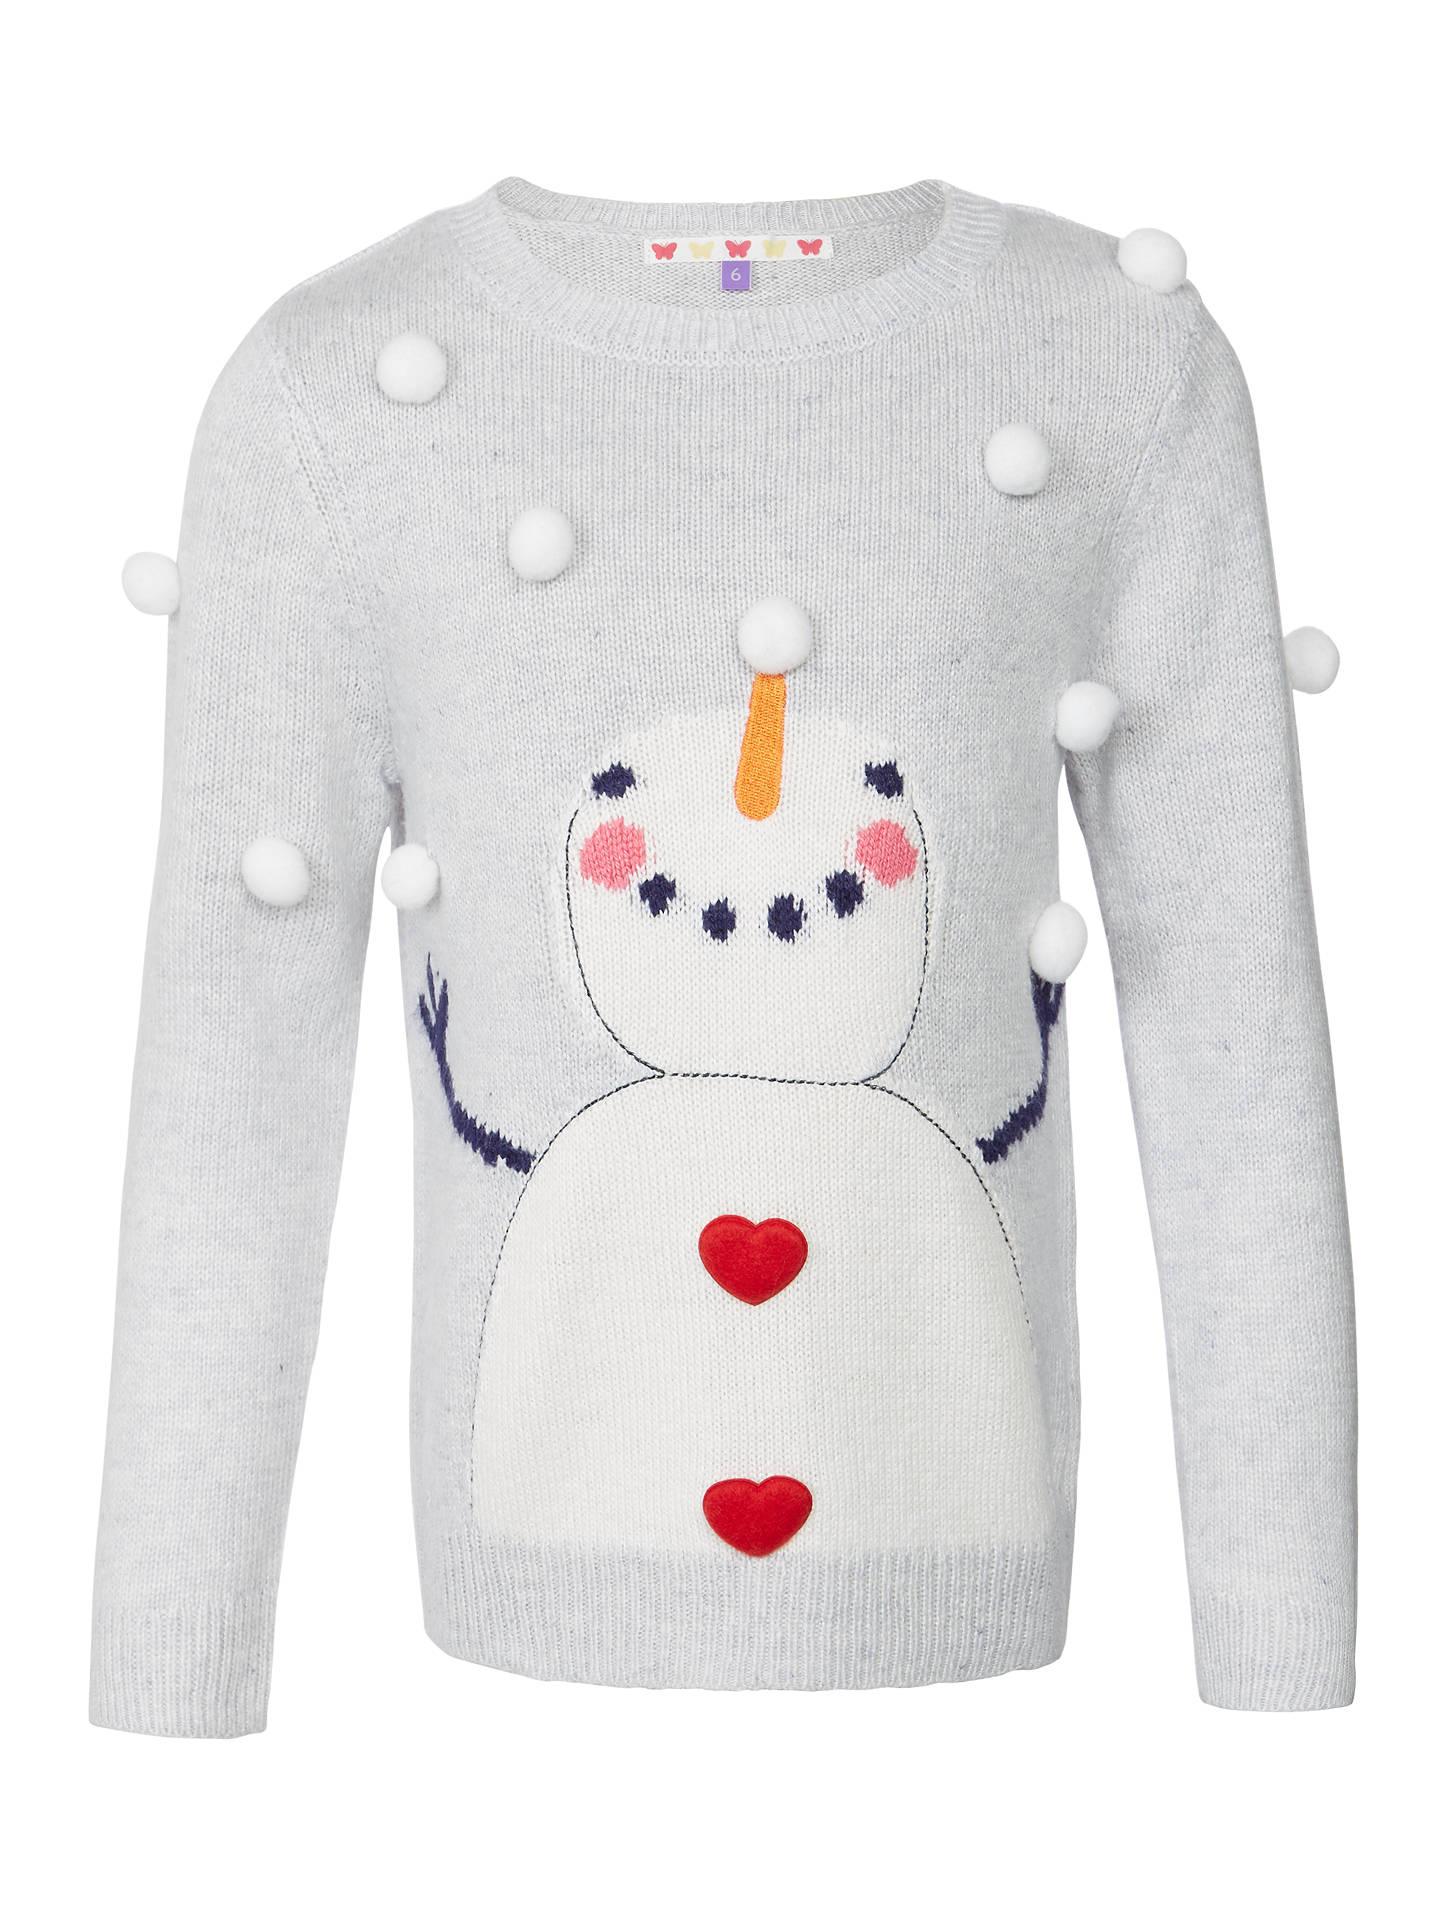 97ca7c06118 Buy John Lewis Girls  Christmas Snowman Jumper